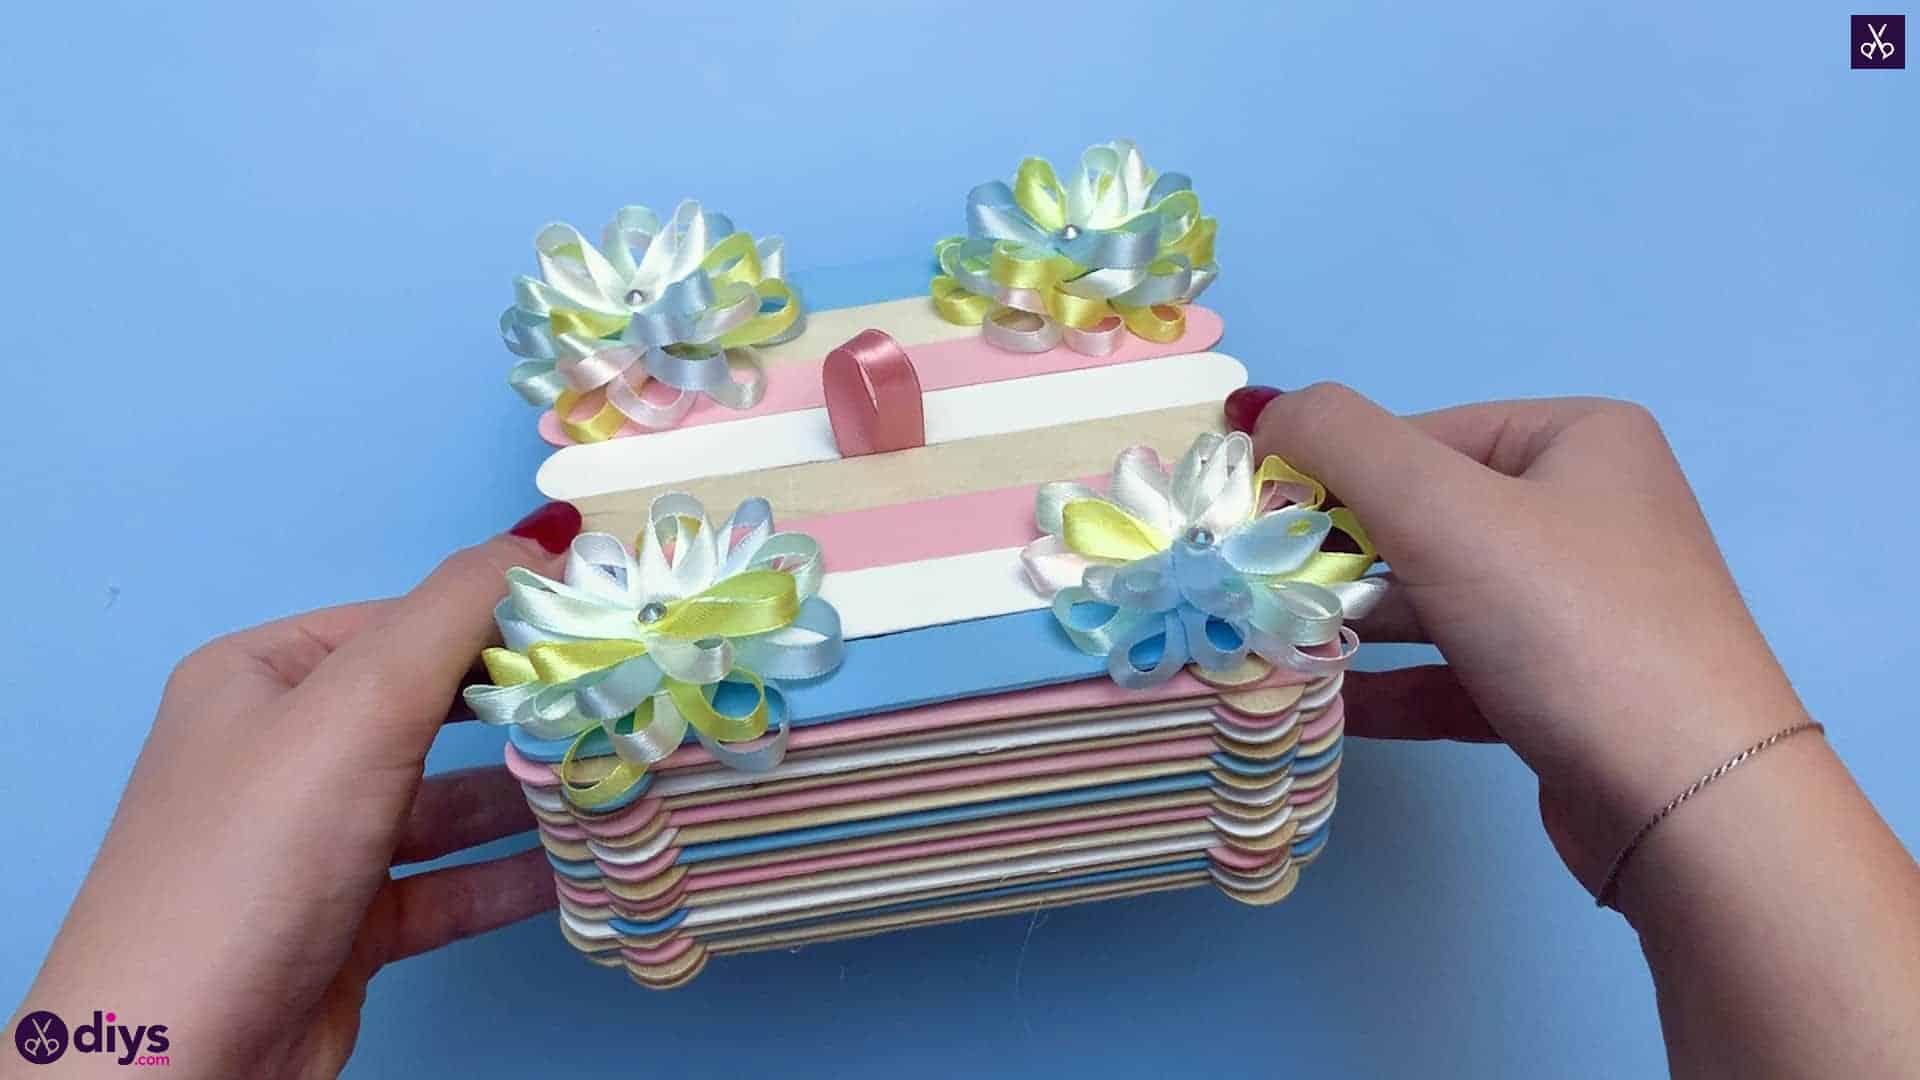 Diy popsicle stick jewelry box